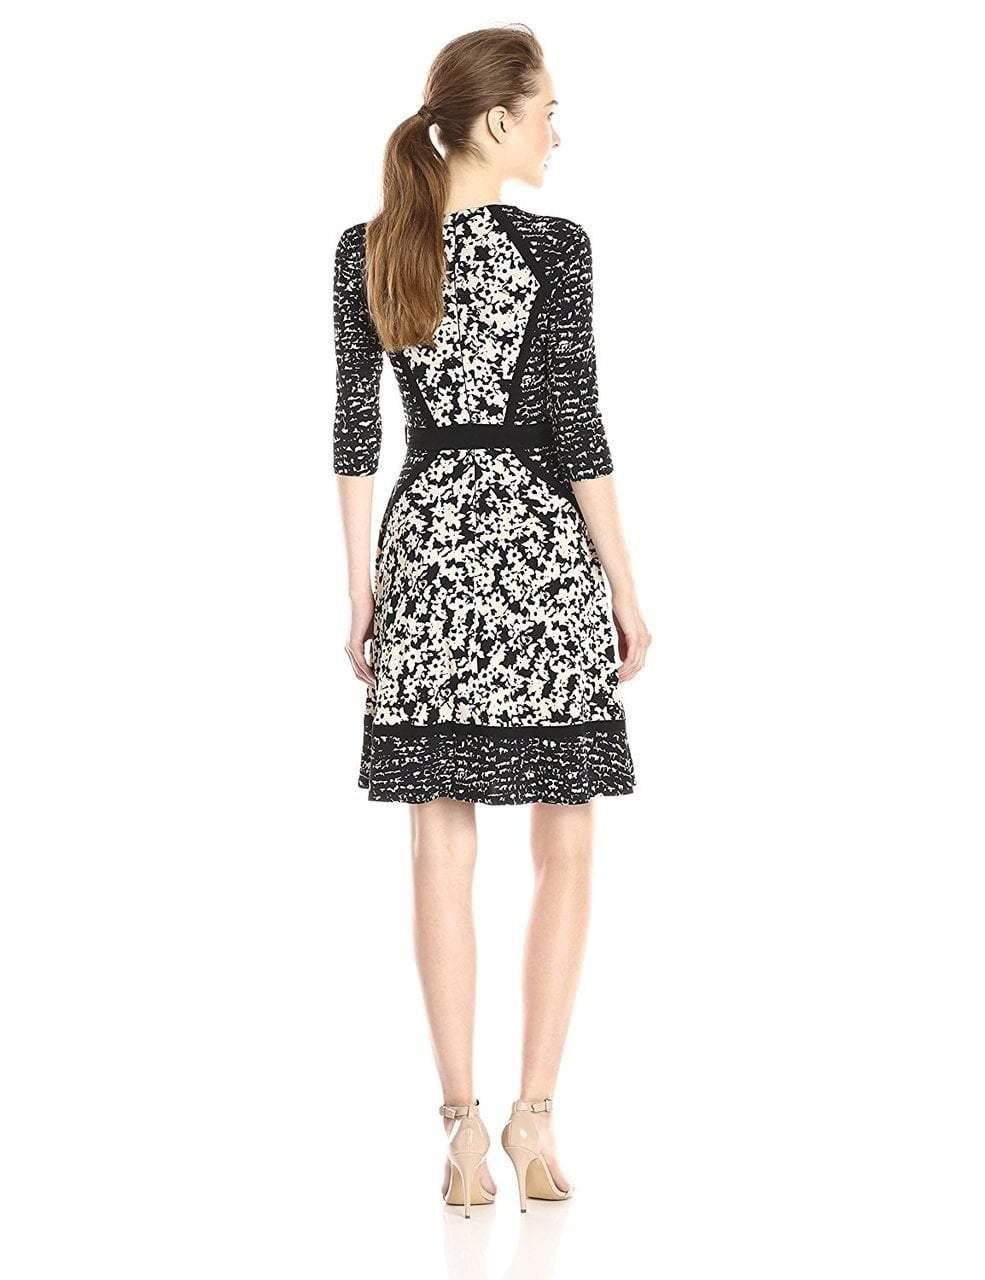 Taylor - 5708MX V-Neck Wrap Print Dress